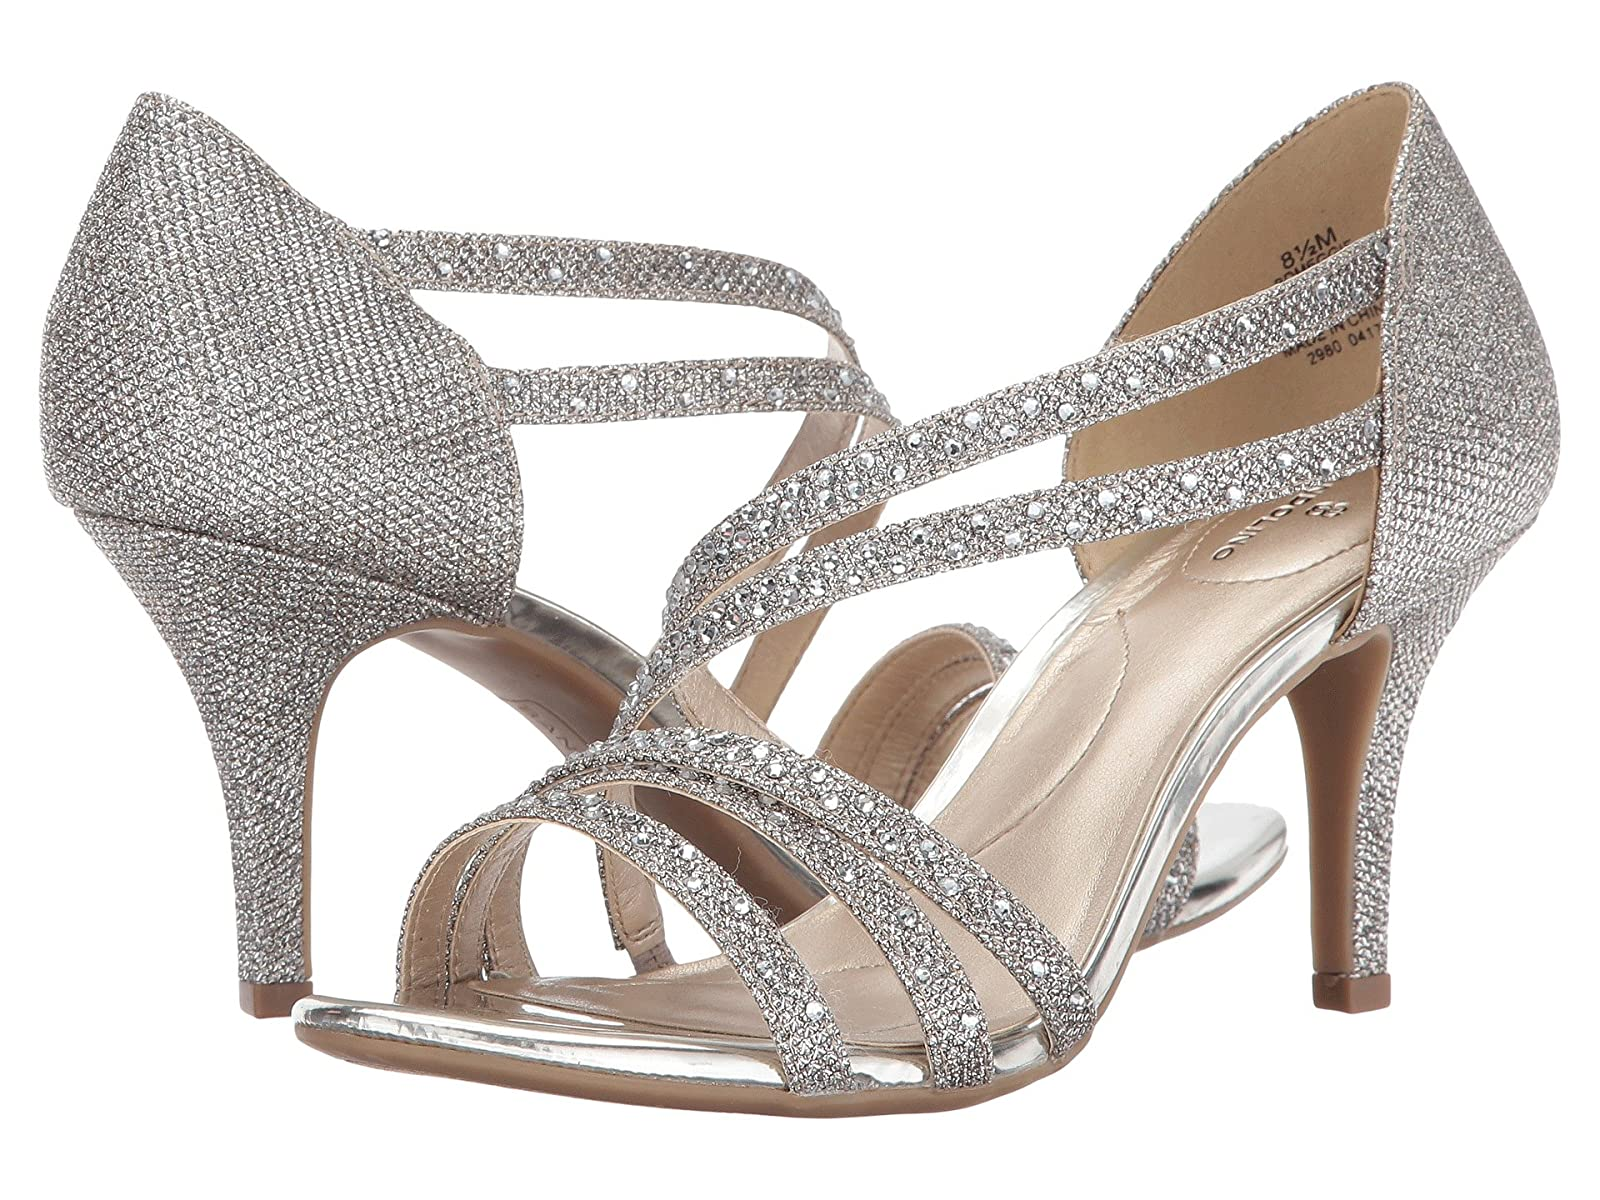 Bandolino MeggieCheap and distinctive eye-catching shoes